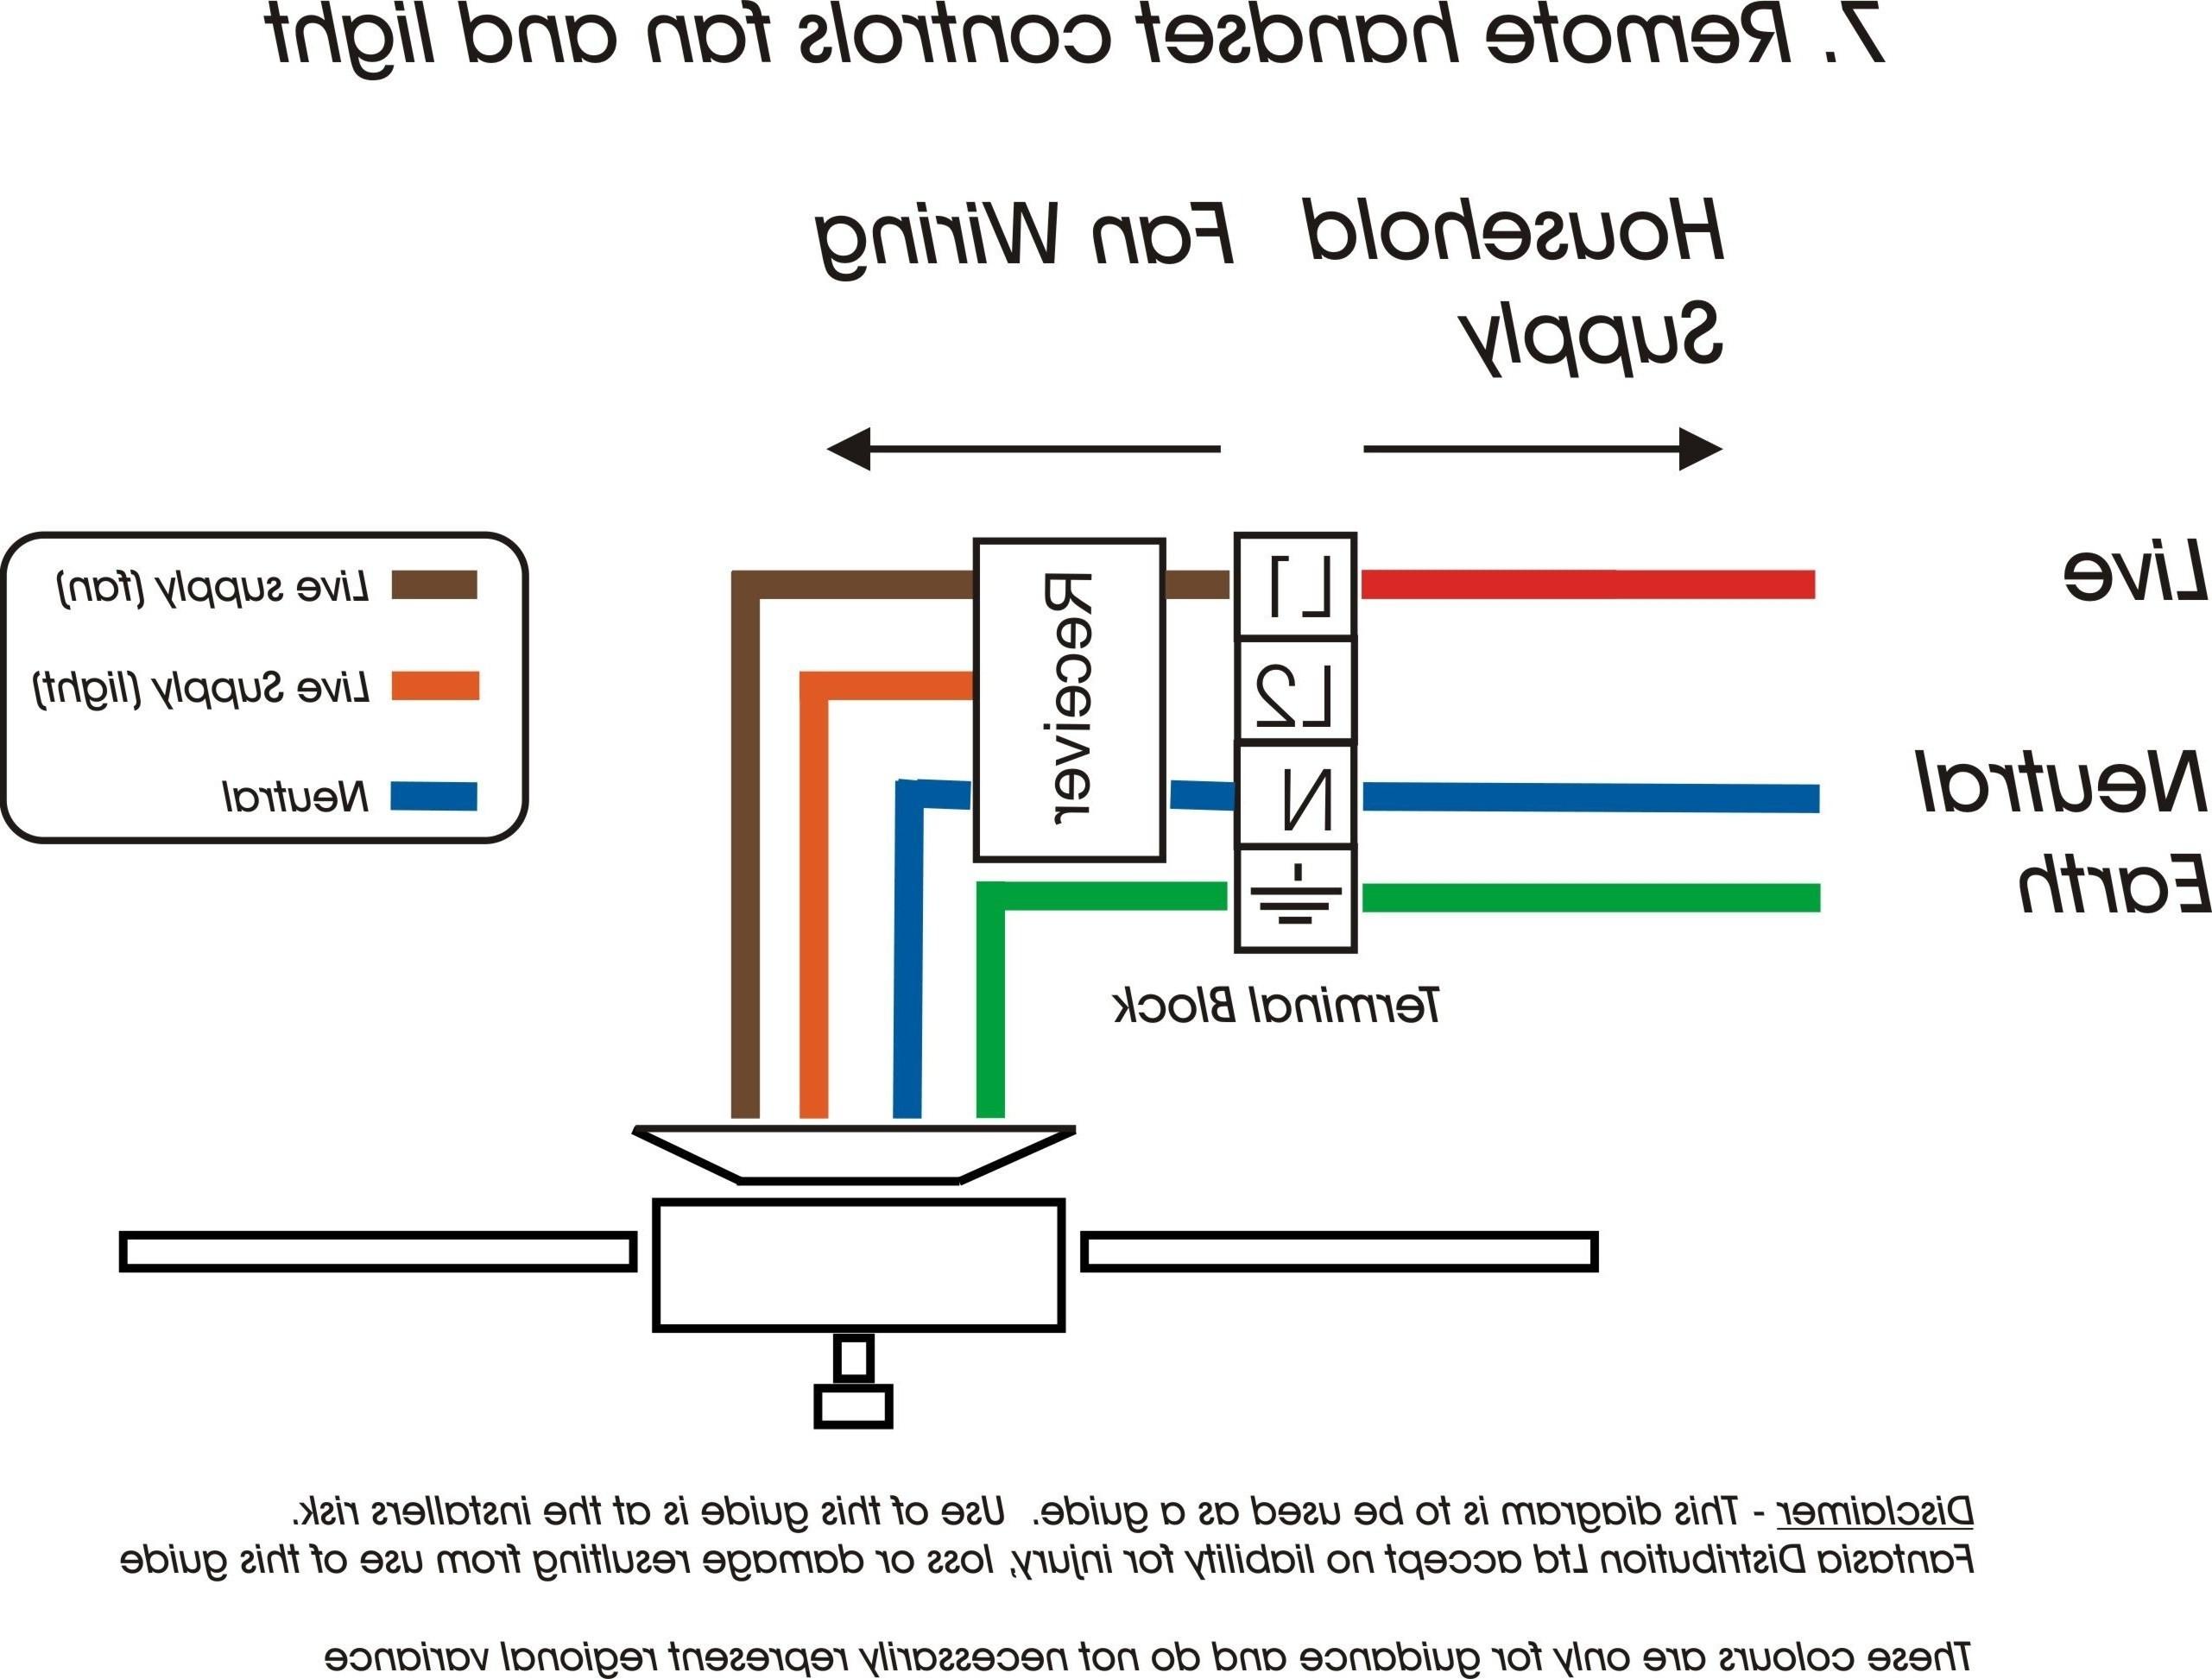 Touch Light Sensor Wiring Diagram - All Wiring Diagram - Touch Lamp Sensor Wiring Diagram